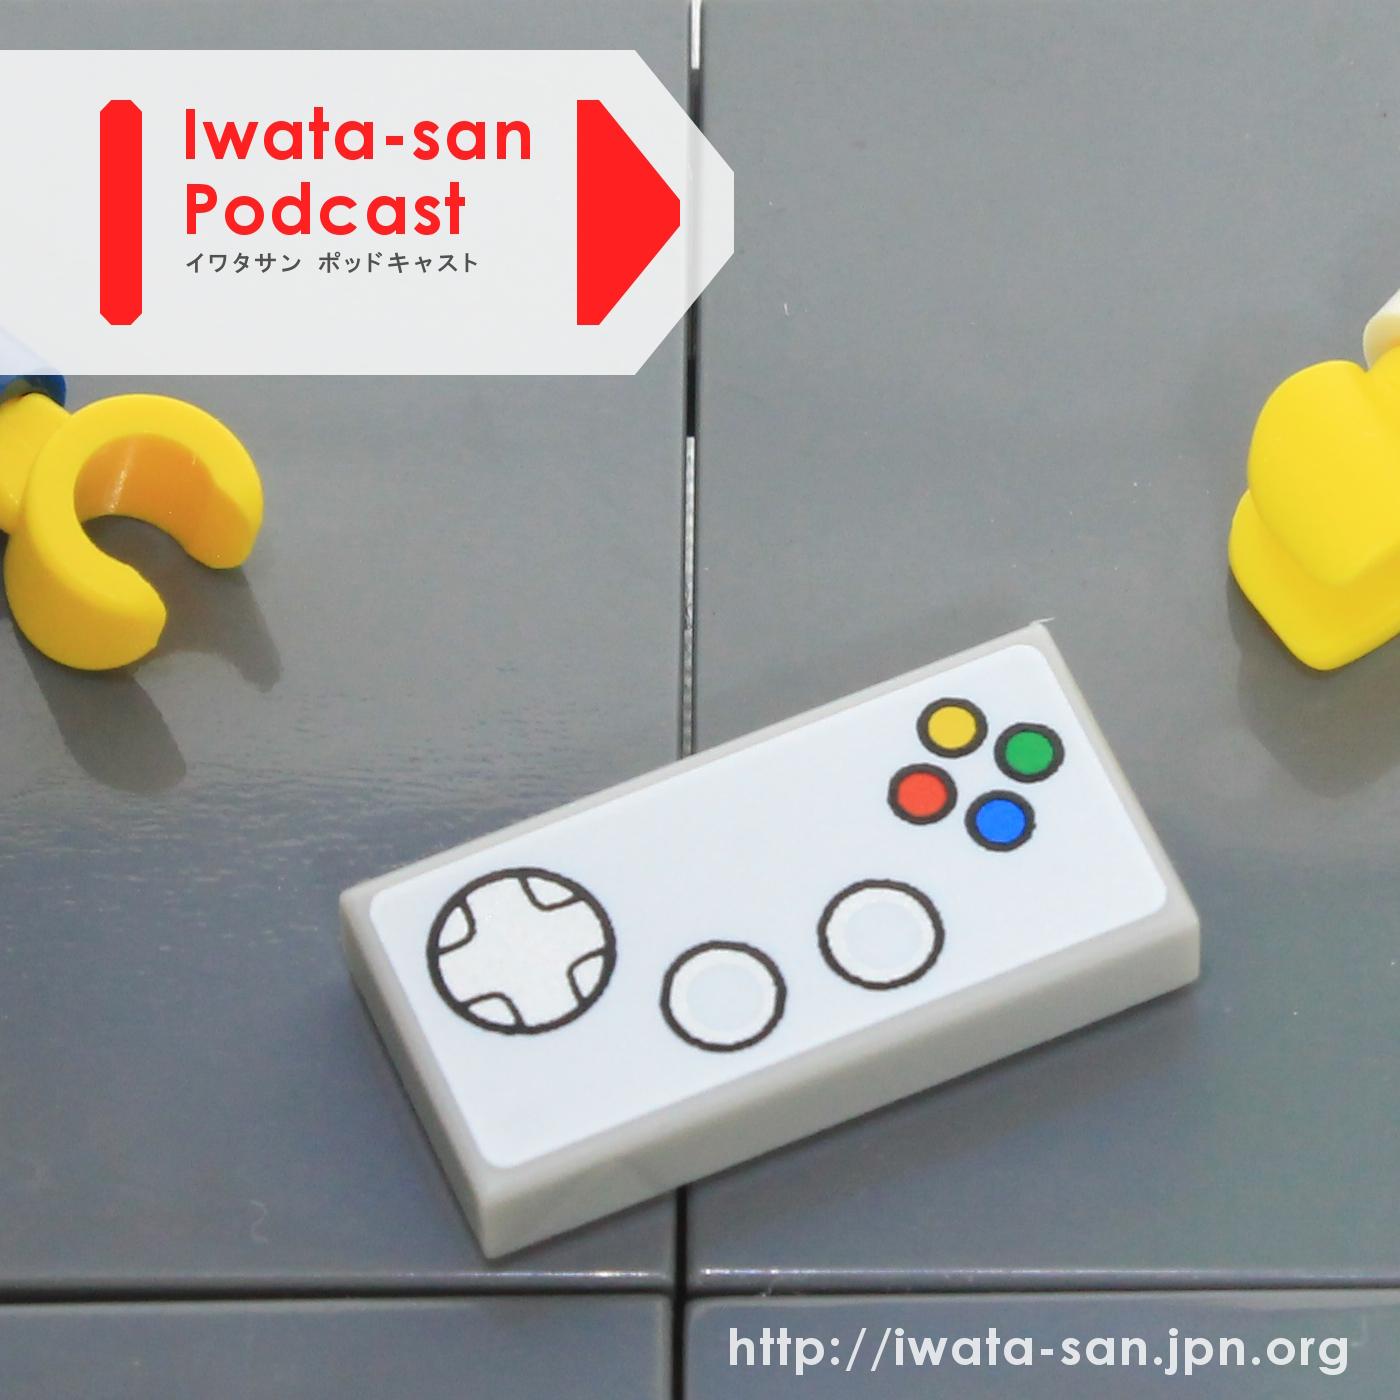 Iwata-san Podcast